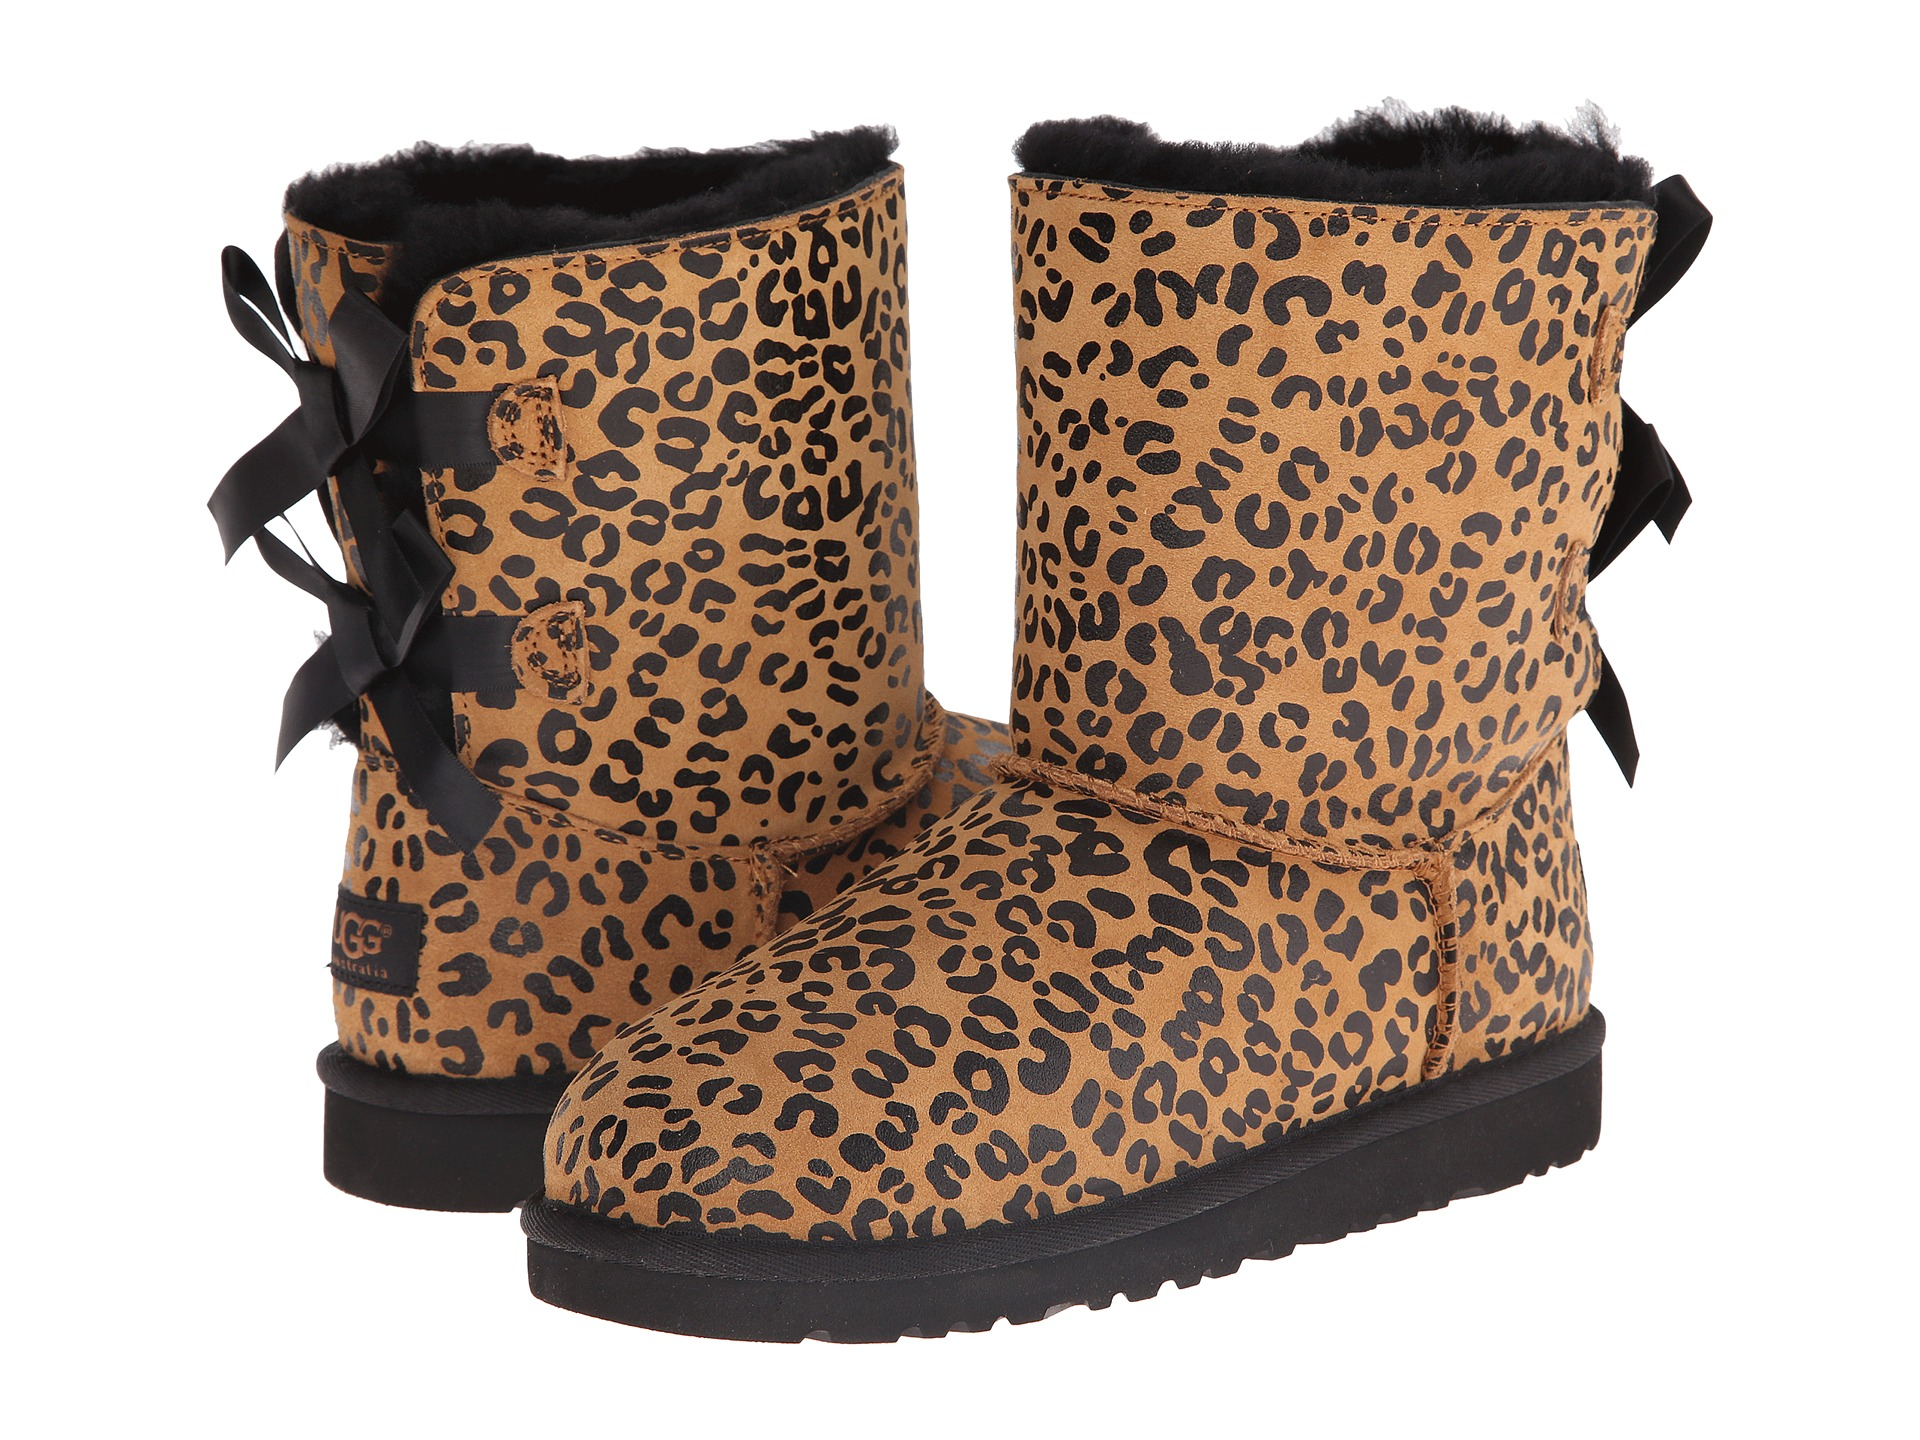 uggs bailey bow leopard